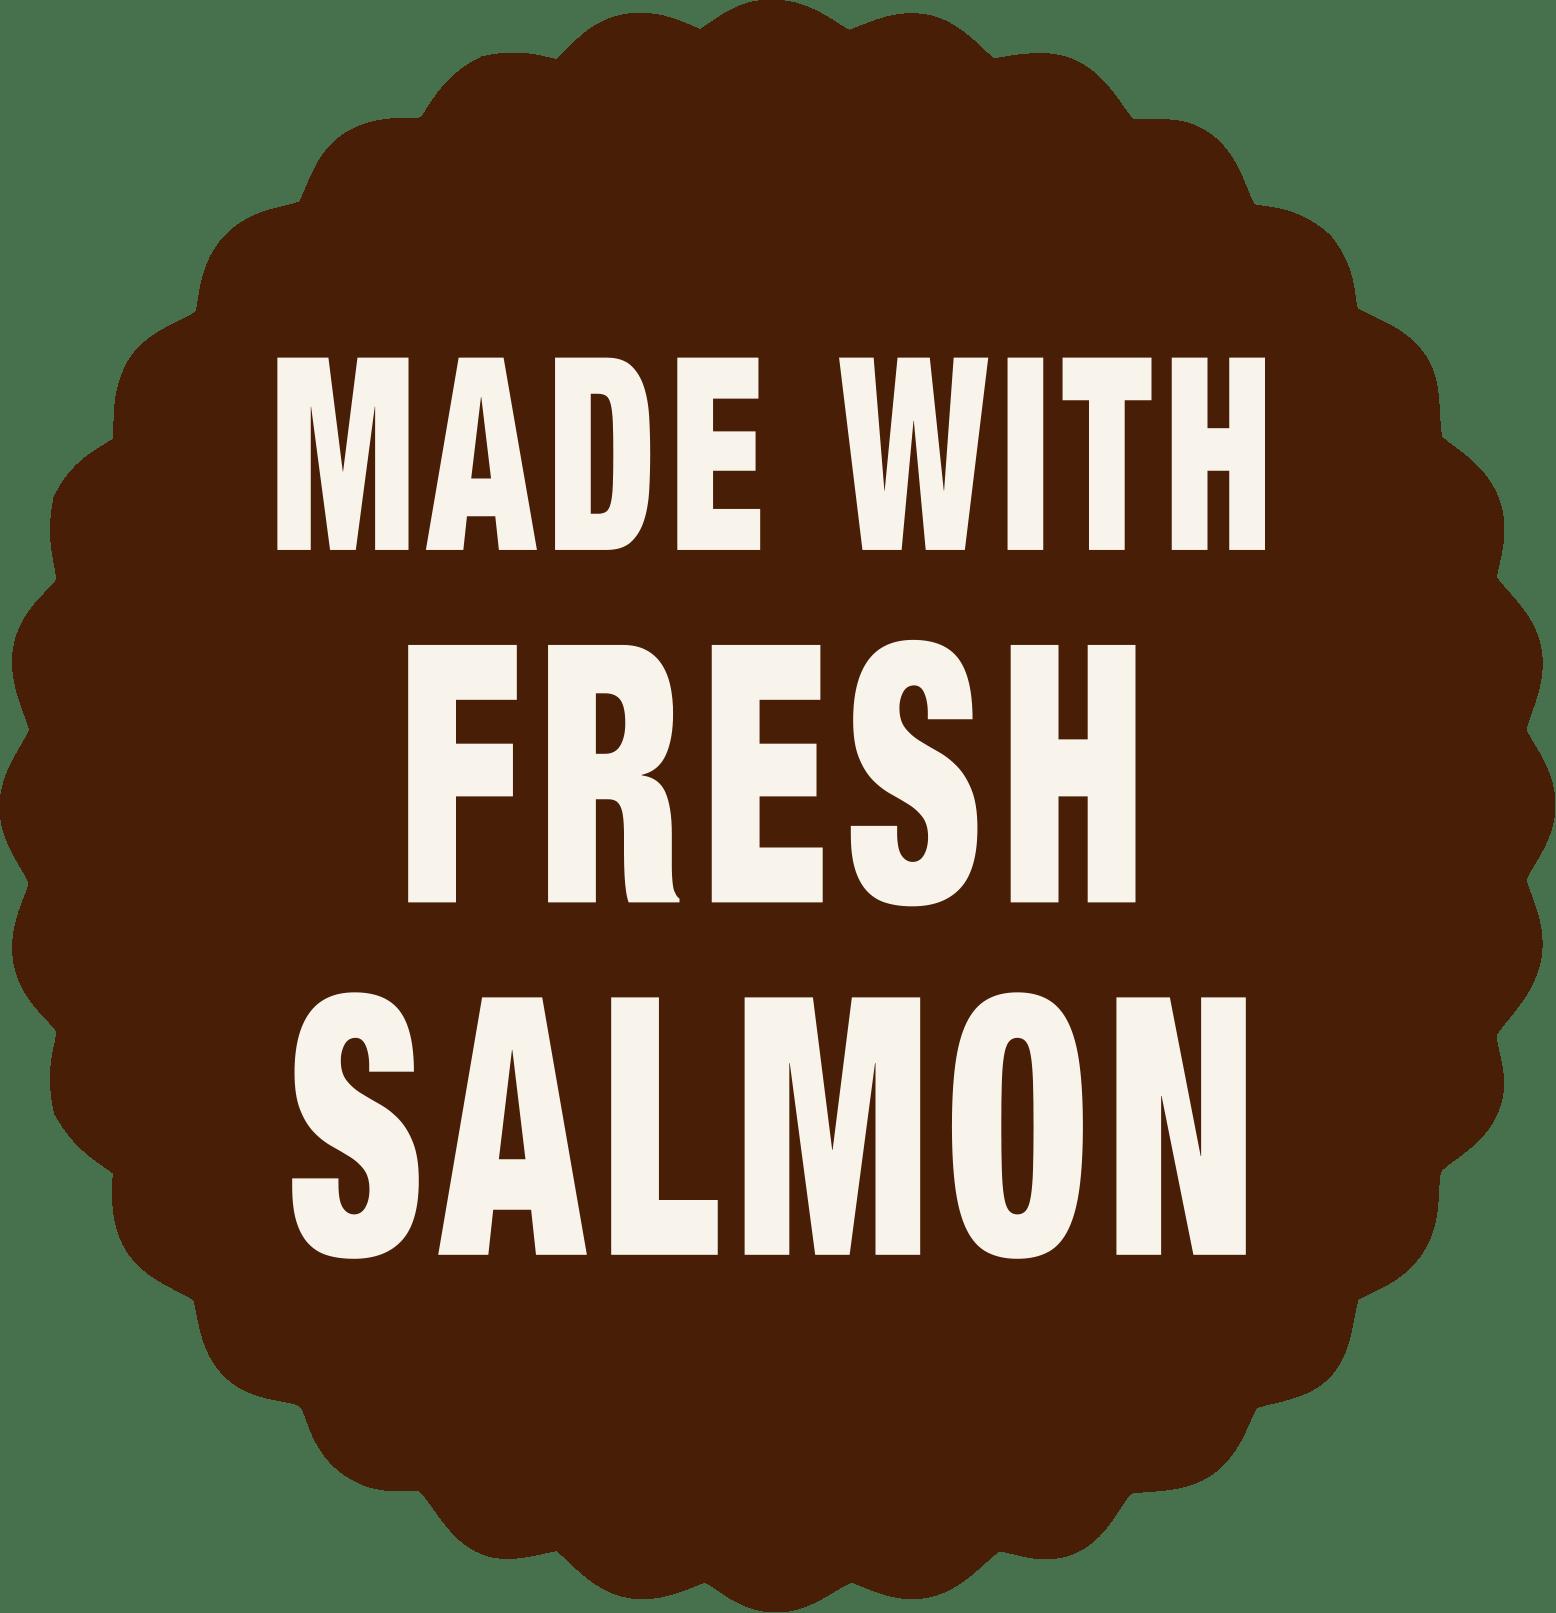 Made with fresh salmon dog food - Laughing Dog Food